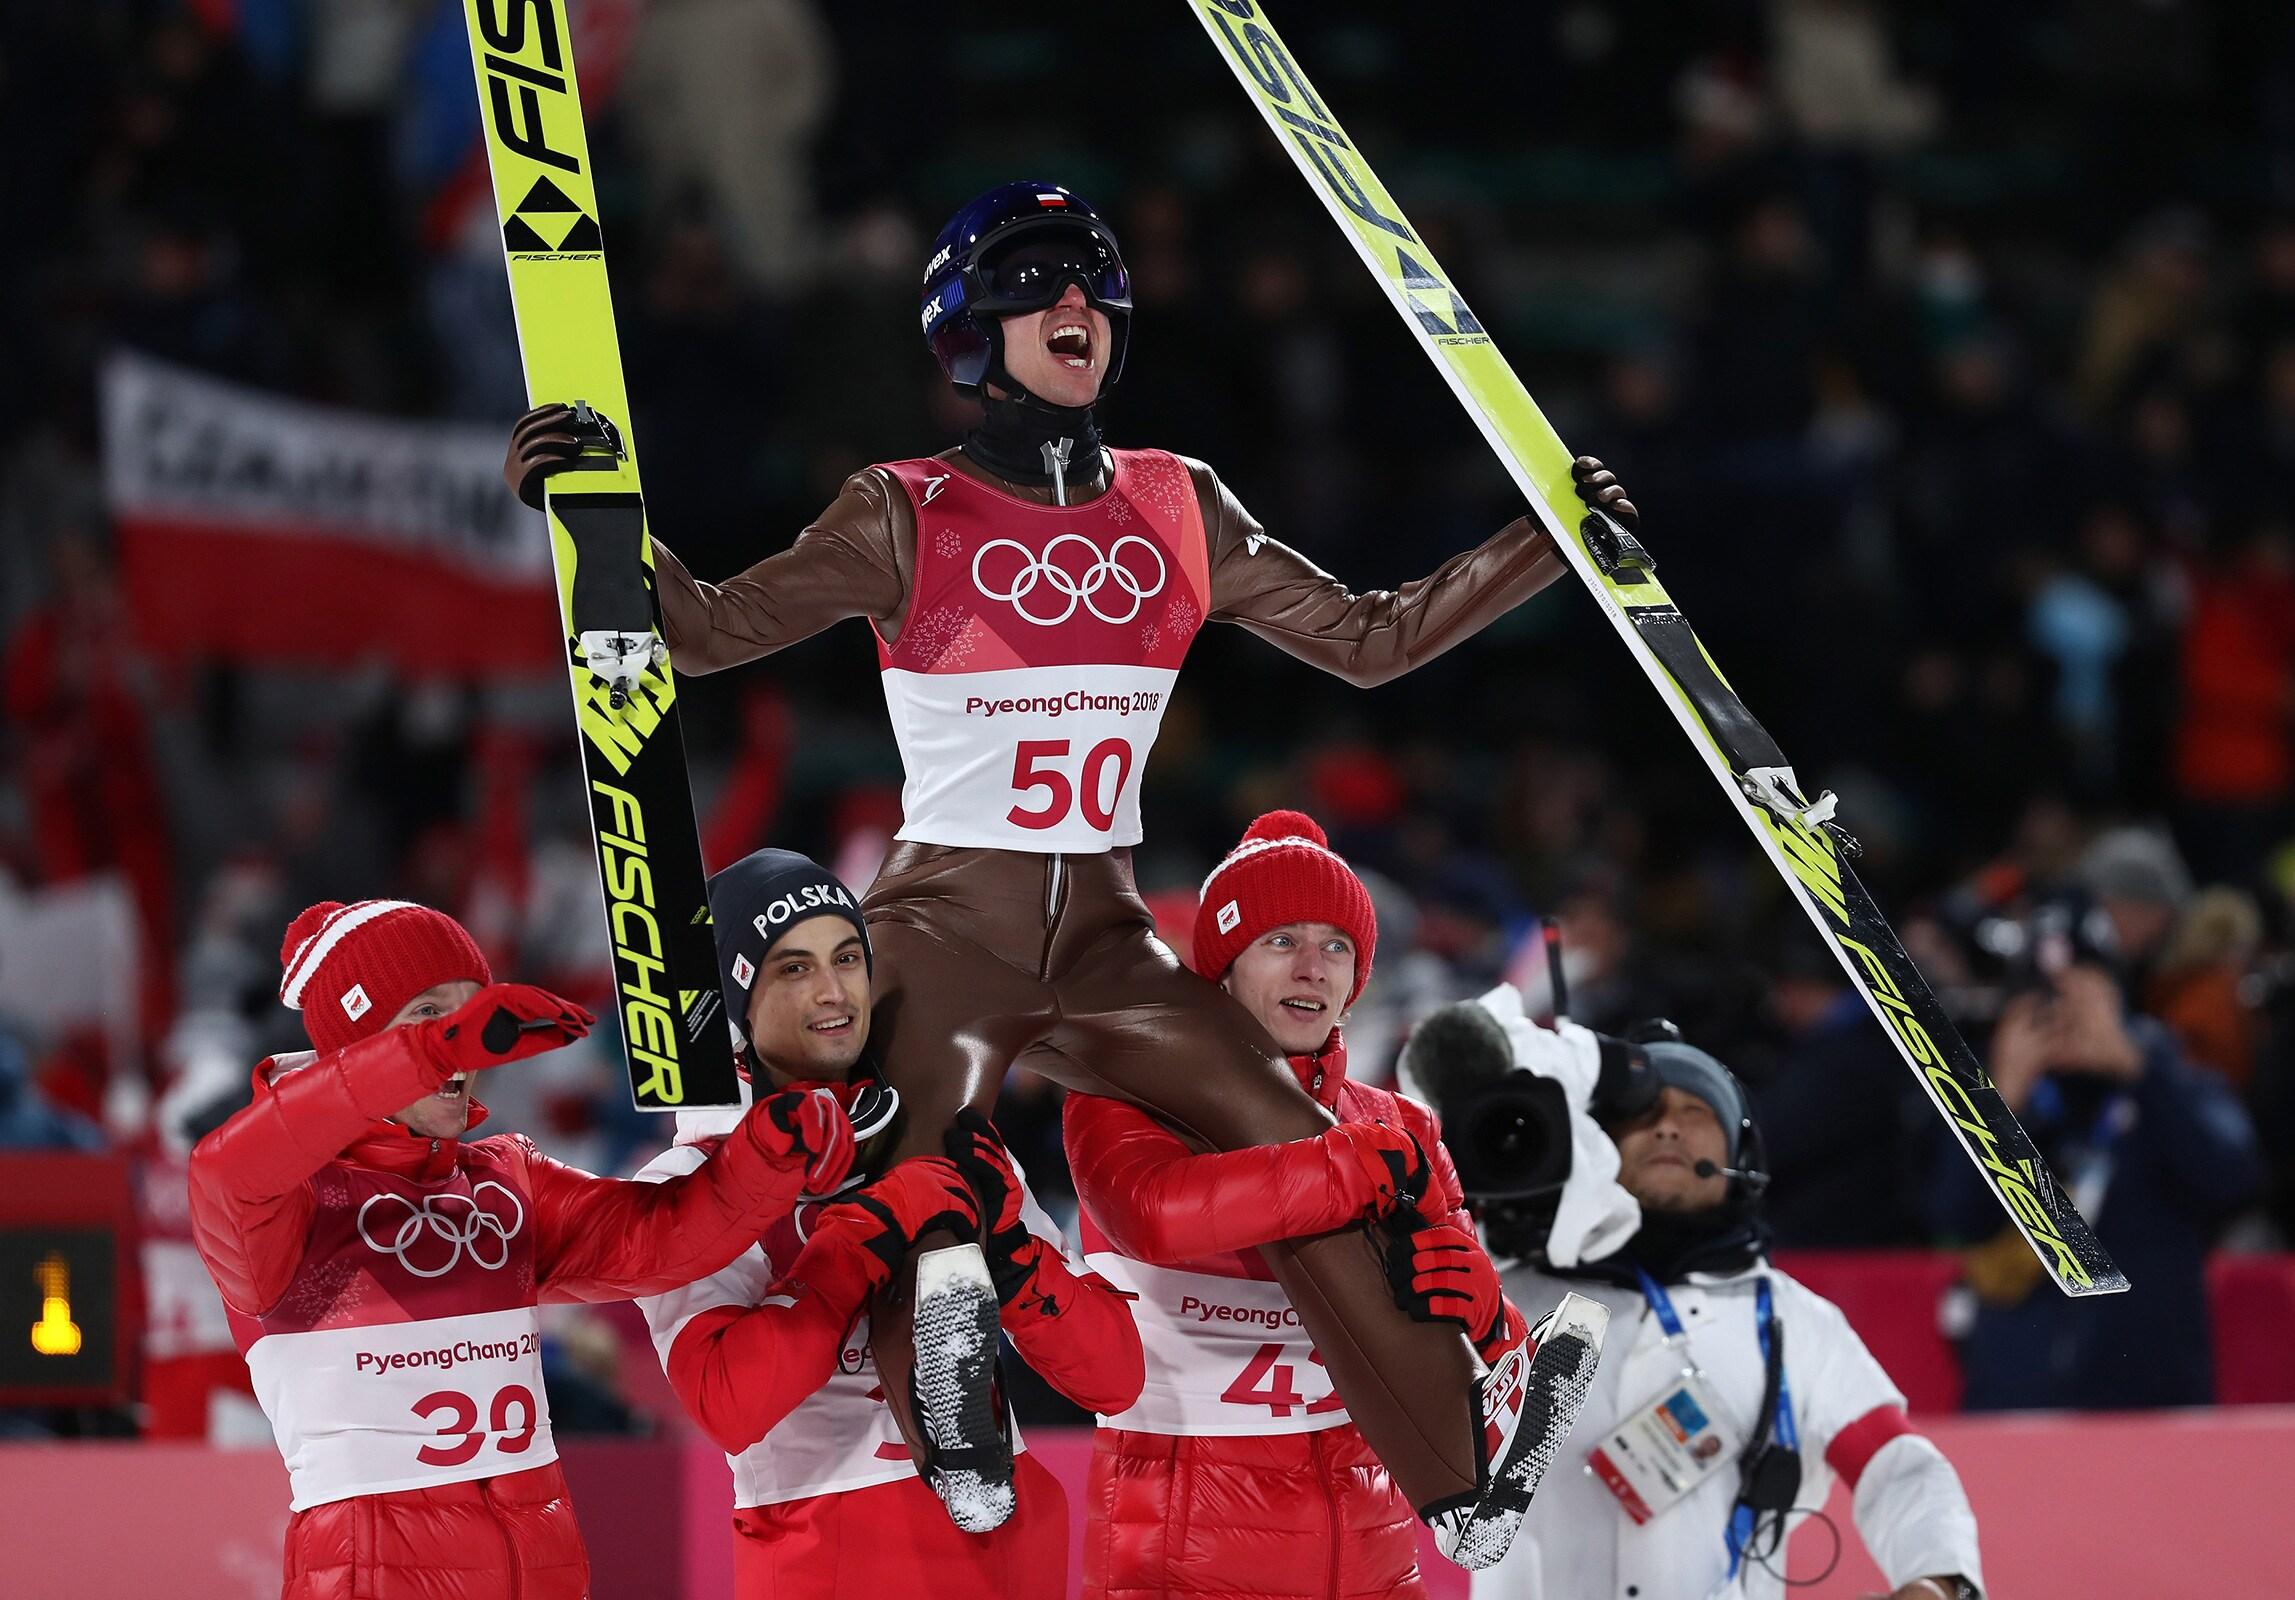 Ski Jumping - Men's Large Hill Individual